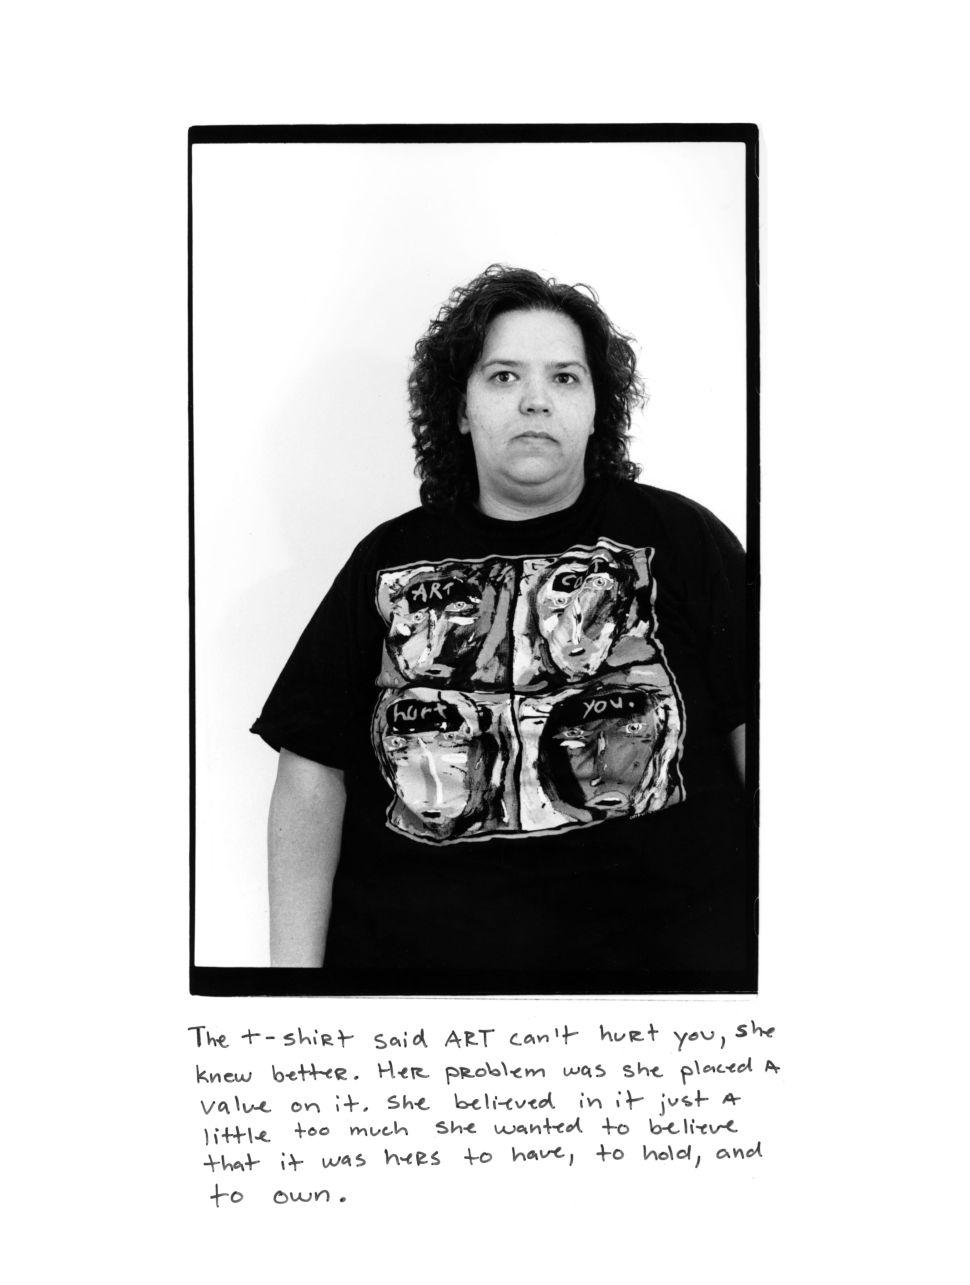 Leslie-Lohman Museum Celebrates Laura Aguilar in Retrospective Exhibition